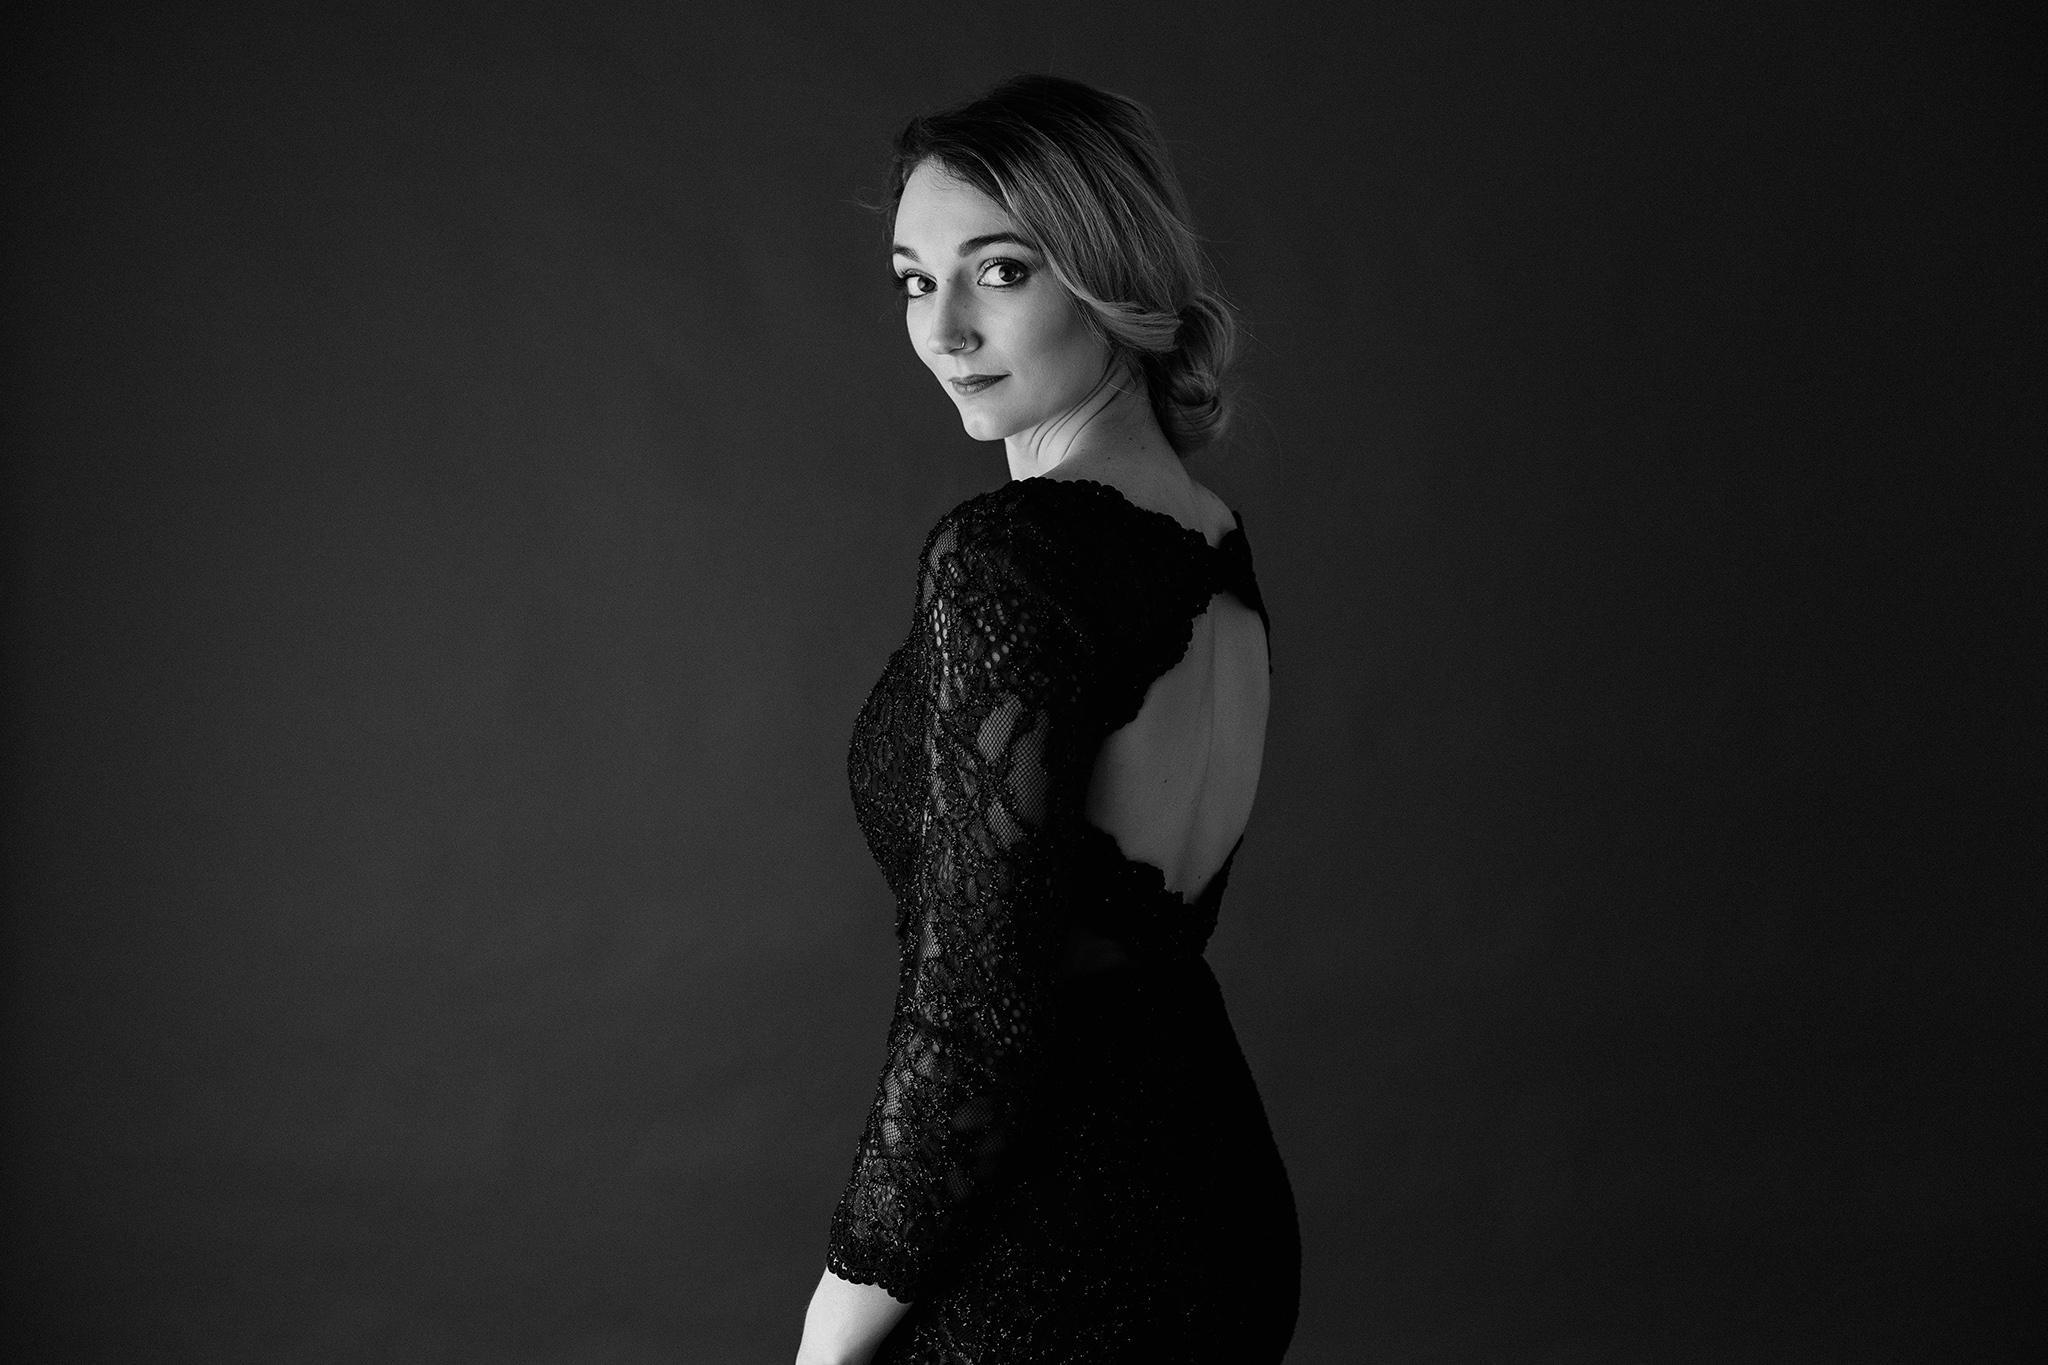 Olympia Washington Photographer - Brittany Martorella